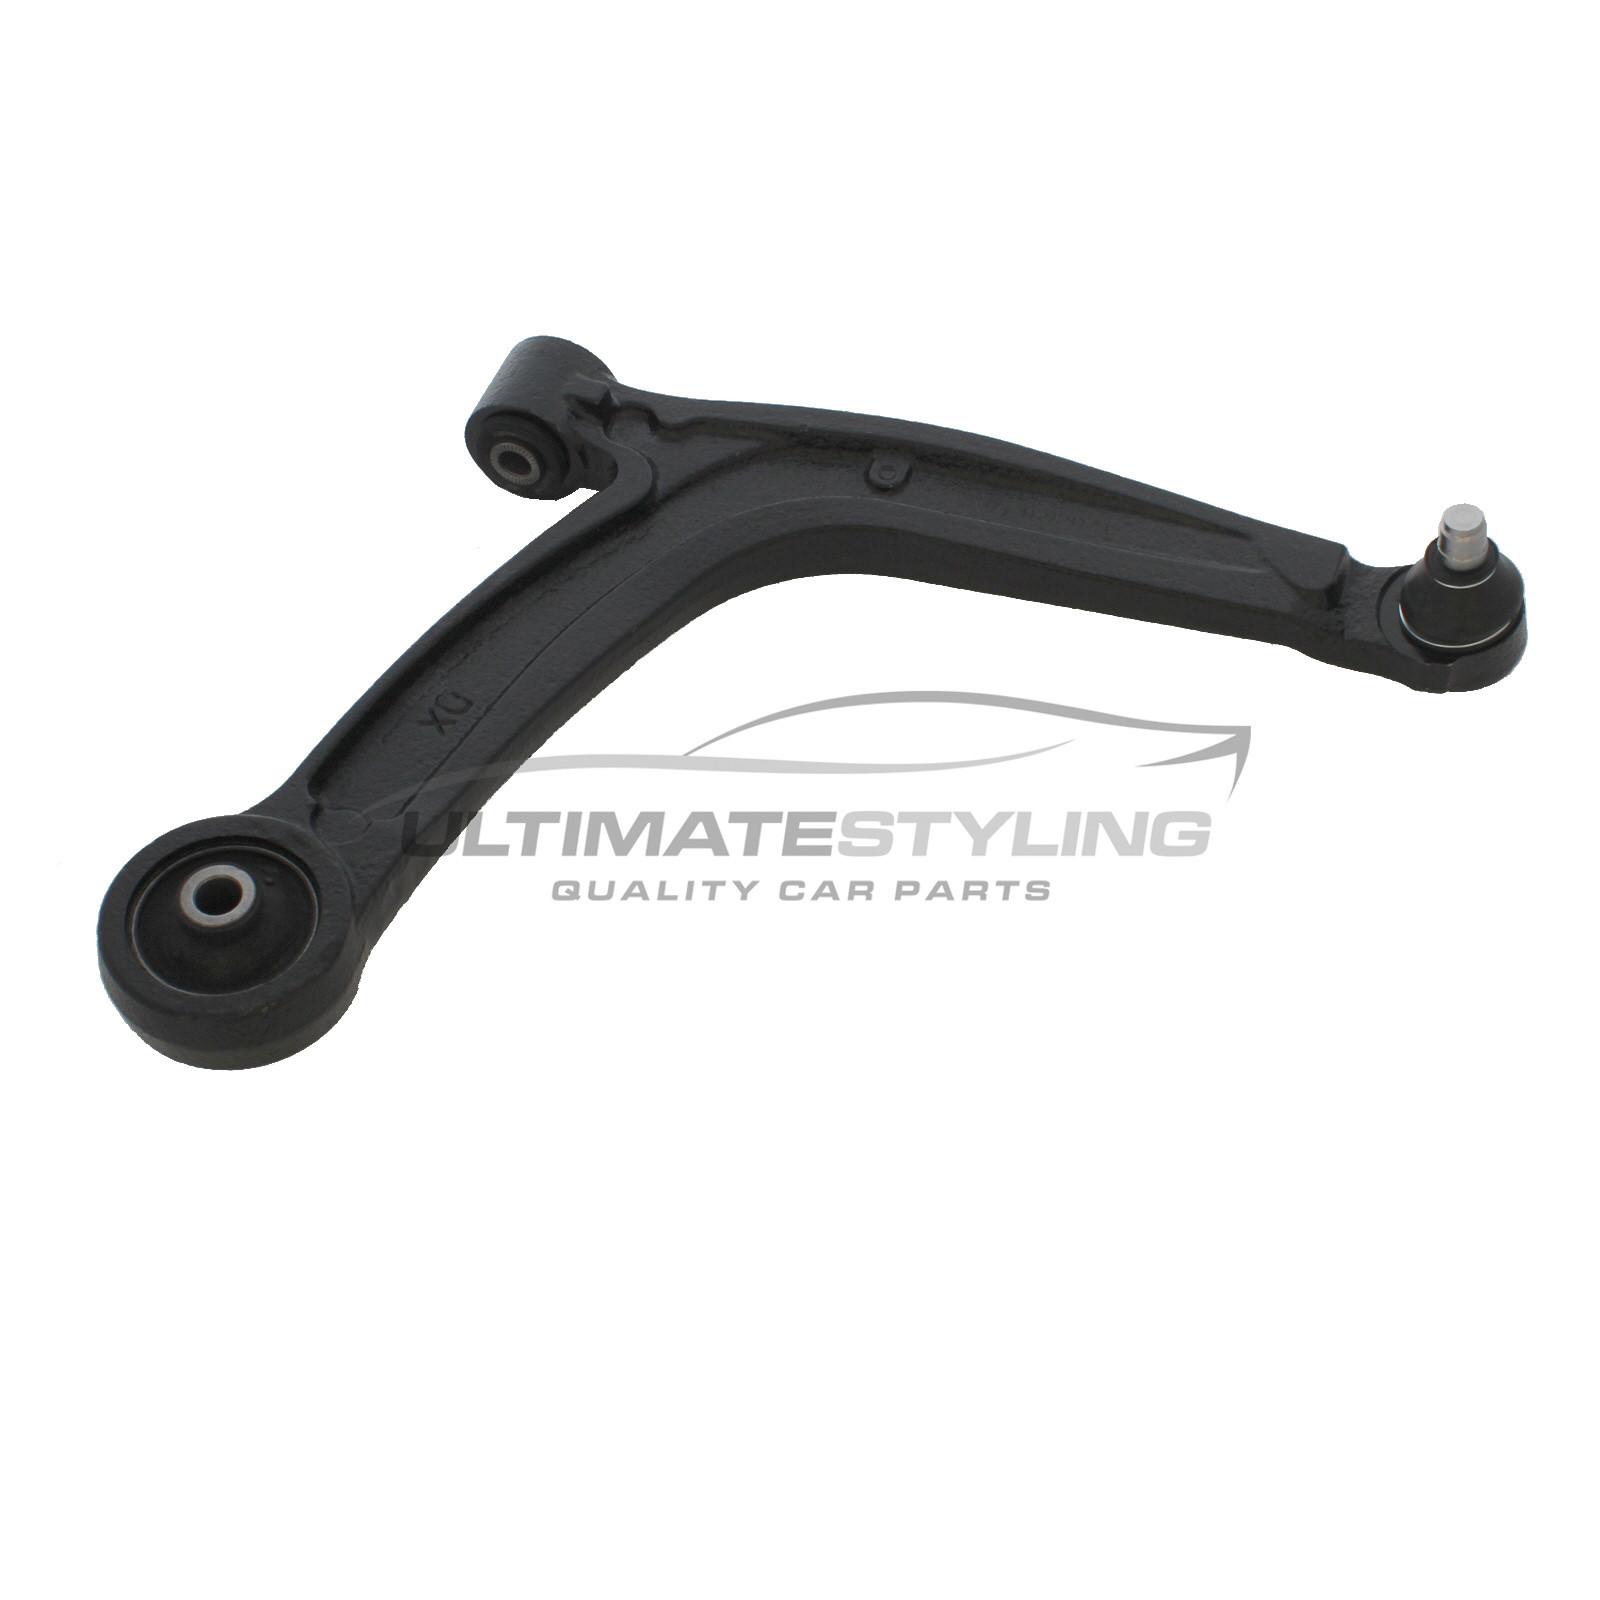 ONE FRONT LOWER WISHBONE SUSPENSION ARM   LH OR RH FIAT 500  1.2 1.3 1.4 08